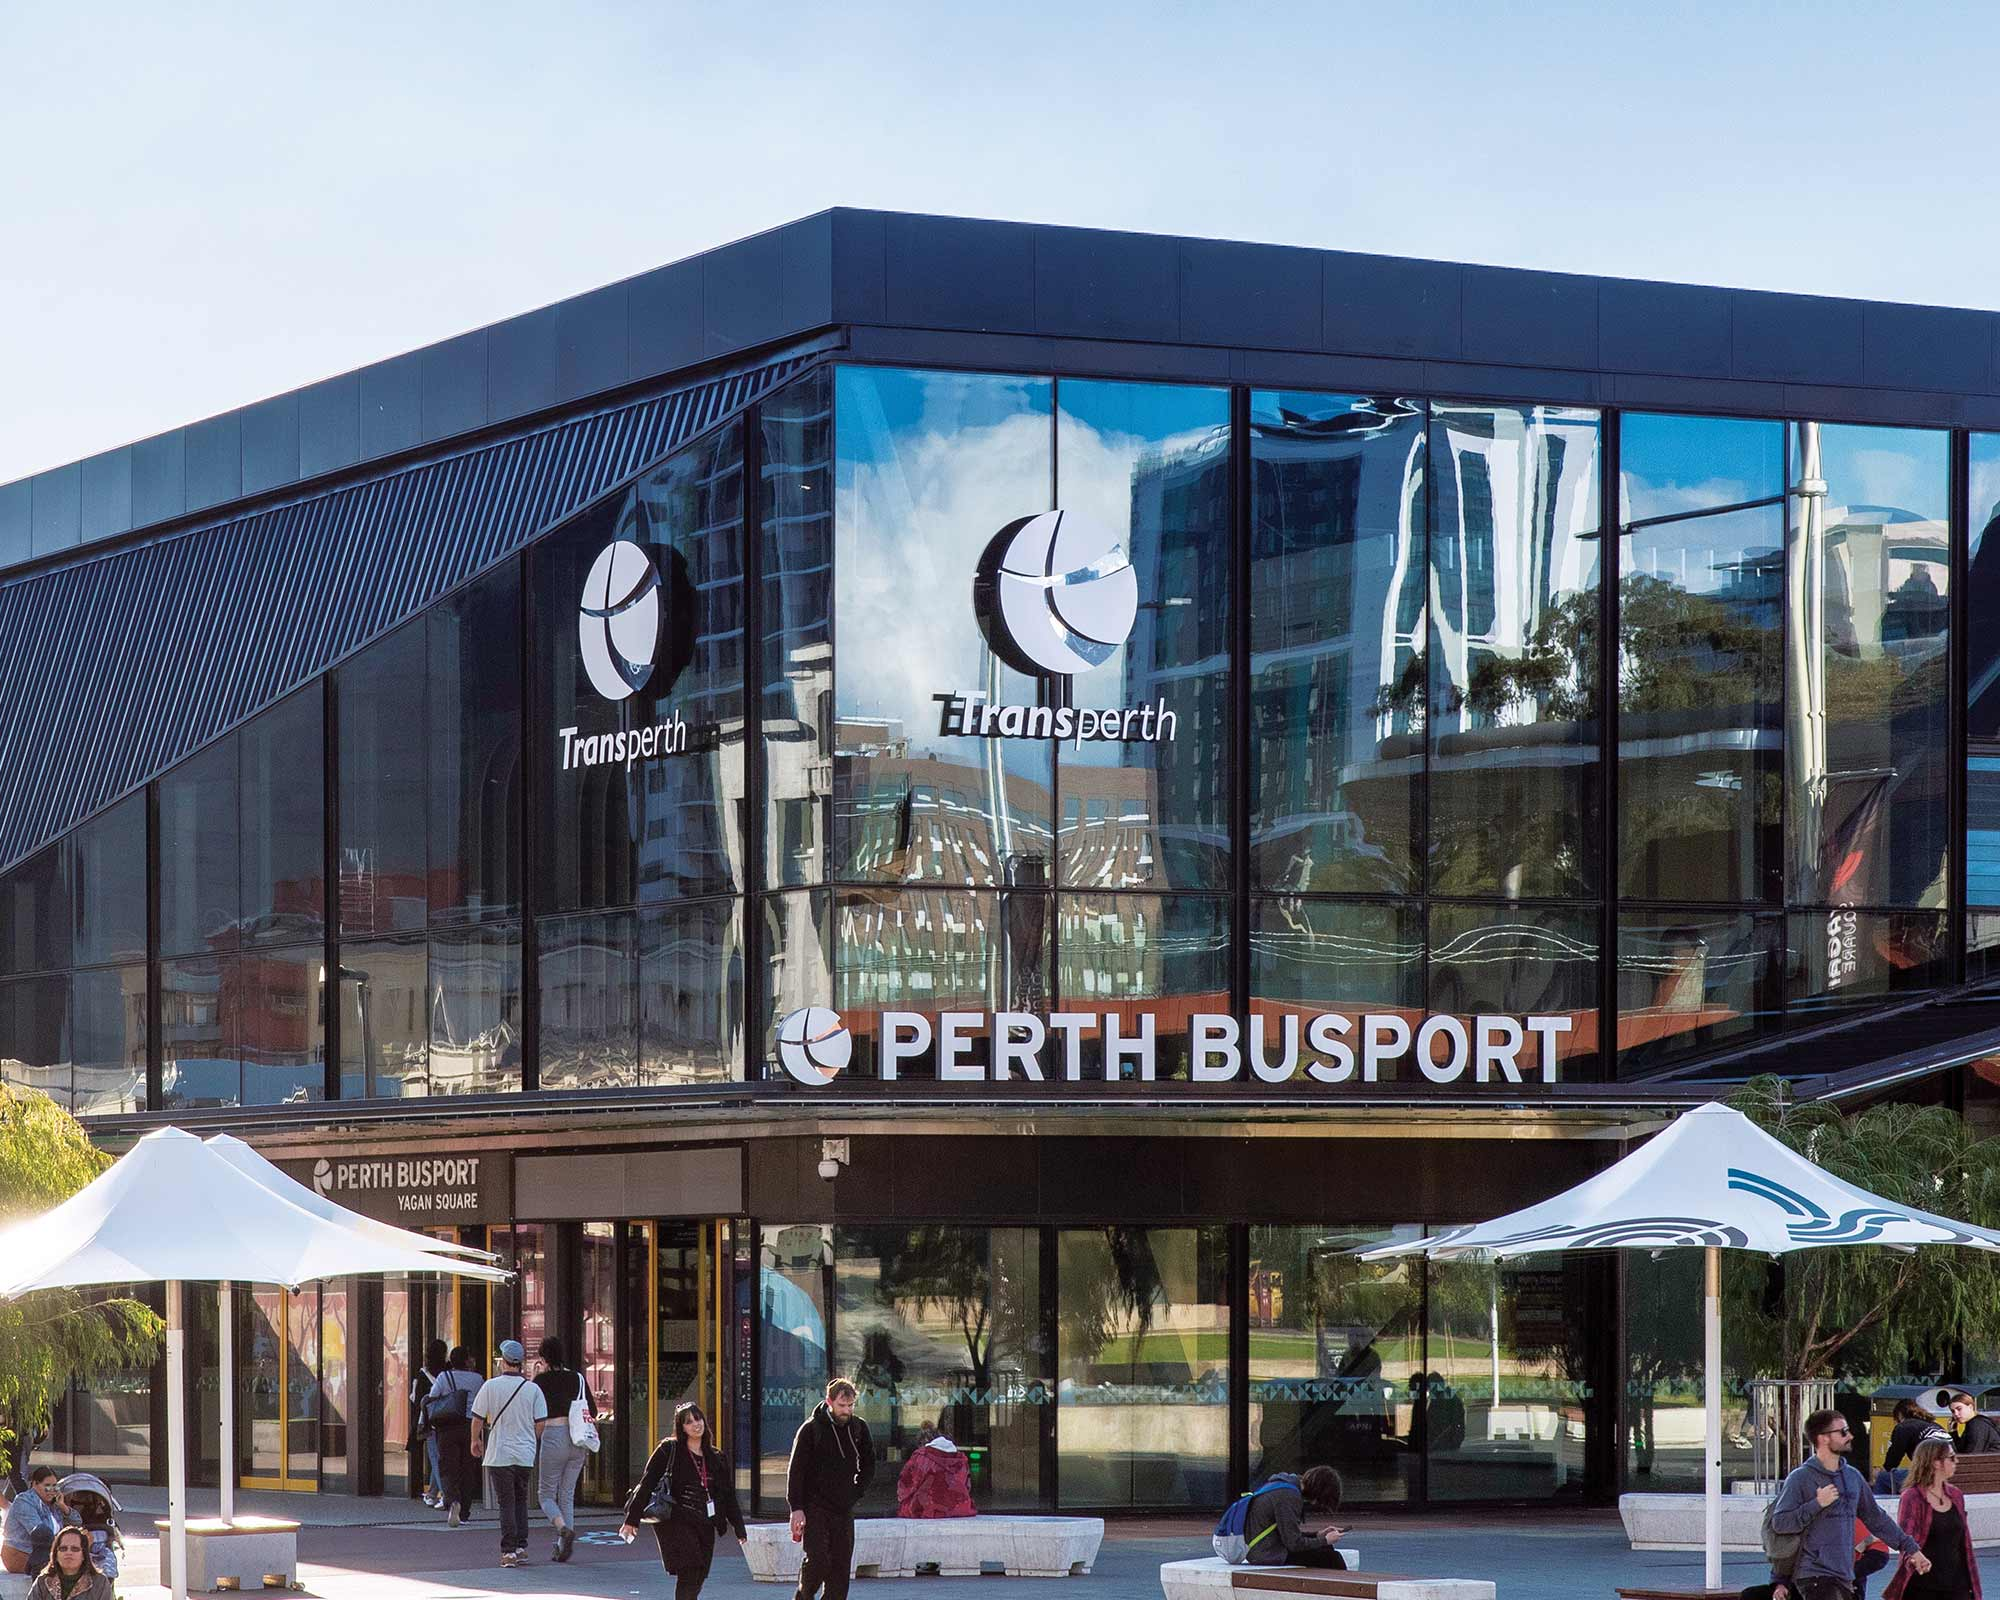 Perth Busport